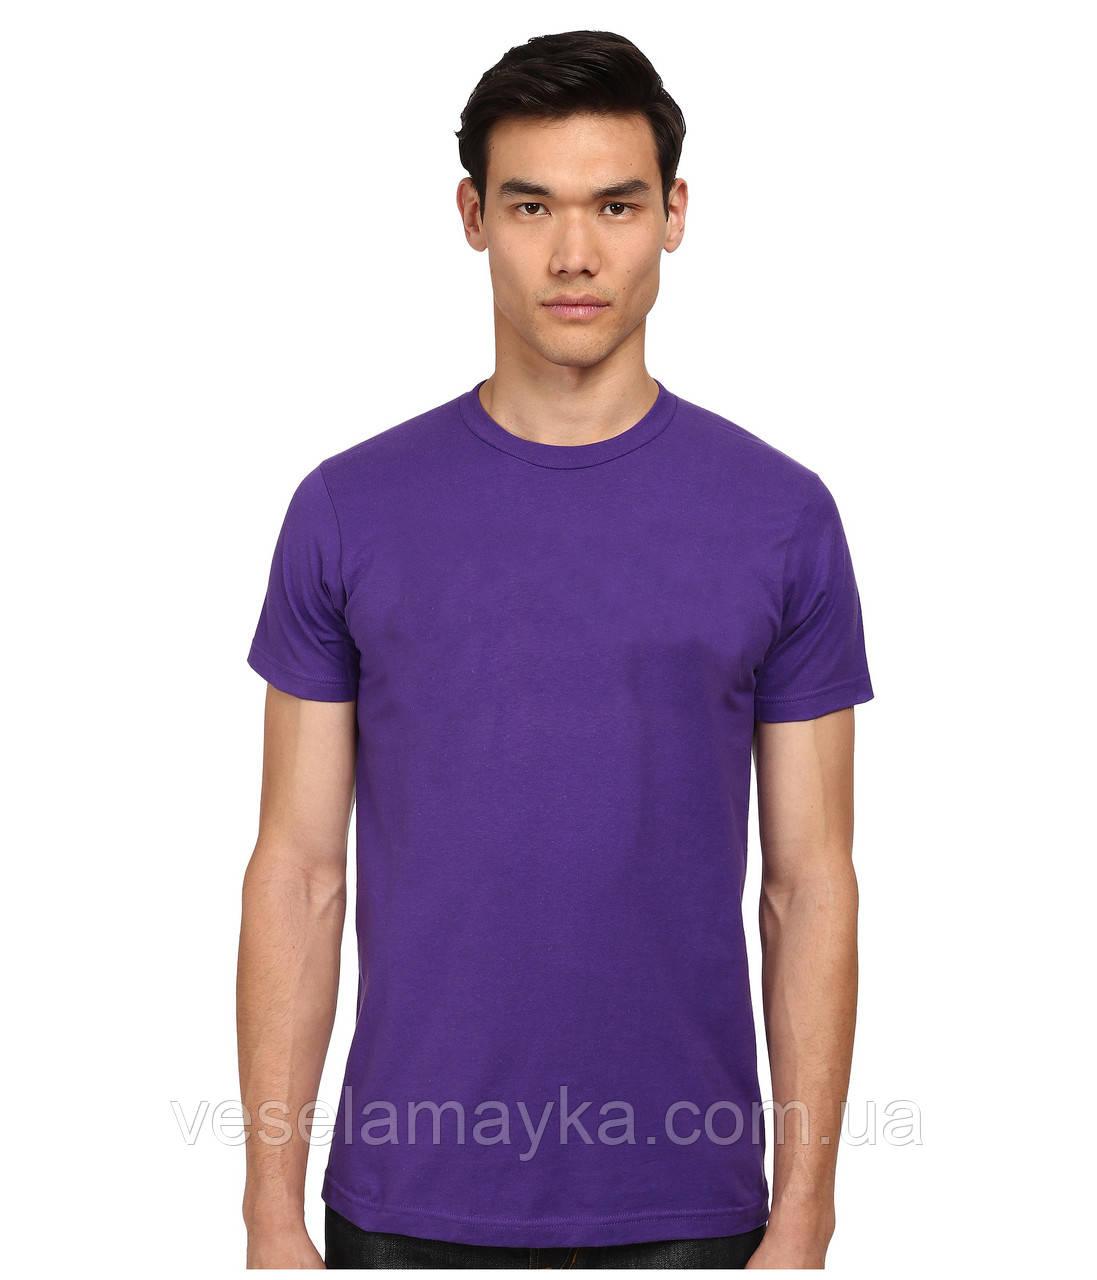 Фіолетова чоловіча футболка (Комфорт)